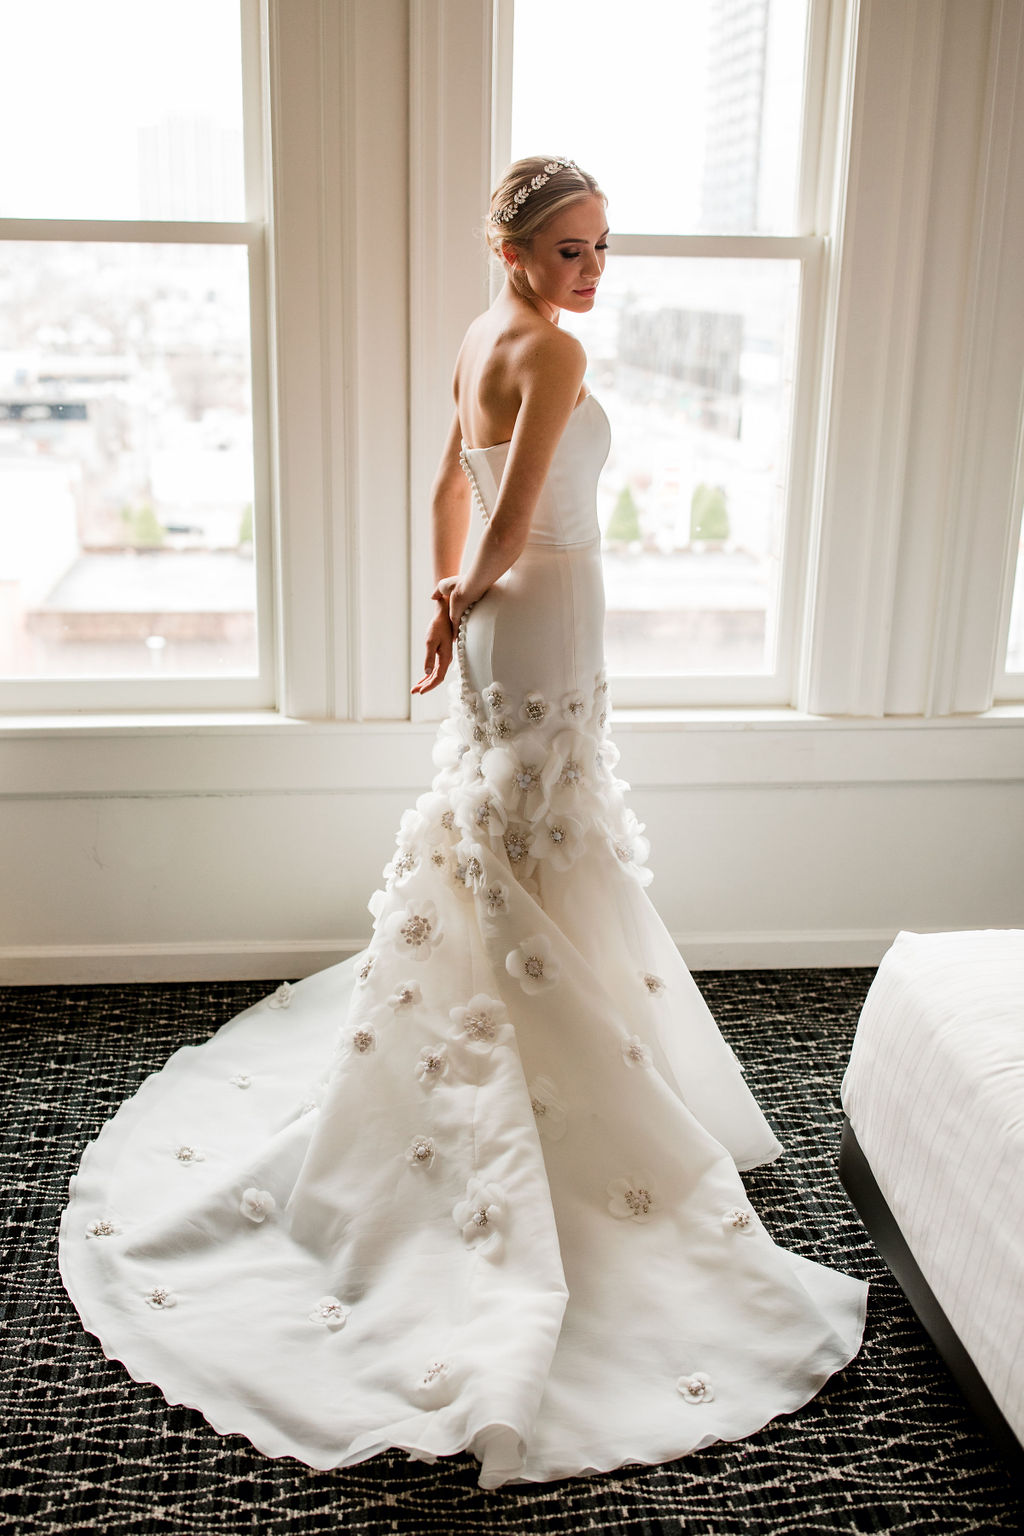 Modern wedding dress: Lavish Union Station Hotel Wedding featured on Nashville Bride Guide